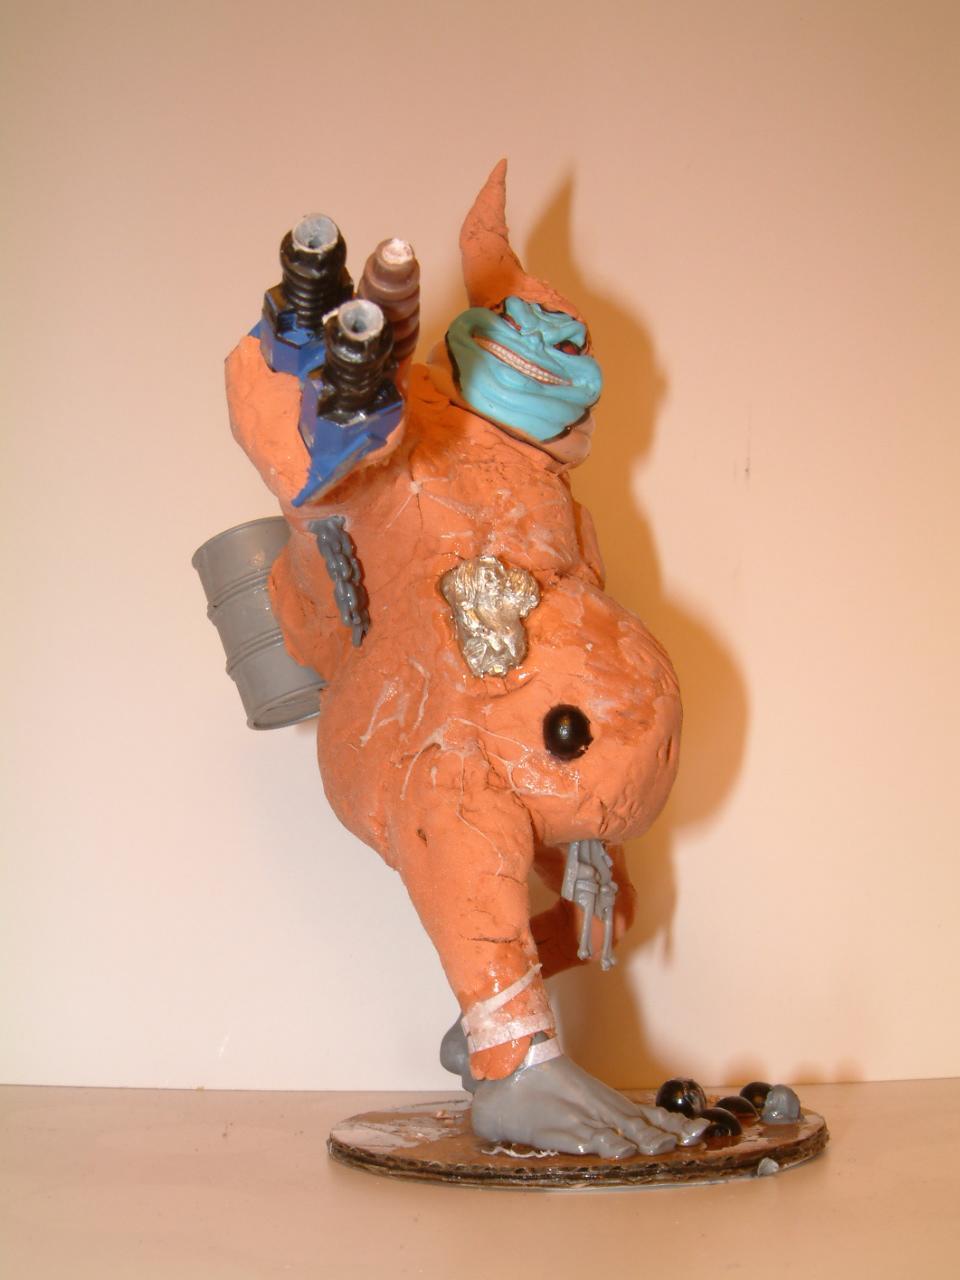 Chaos, Conversion, Crazy, Daemons, Dark, Dead, Done, Garbage, Garbage Garden Gnome, Garden, Ggg, Gnomes, Ice, Imperial, Killacan, Mammon, Mamon, Nurgle, Primach, Scratch Build, Space Marines, Work In Progress, Xemos